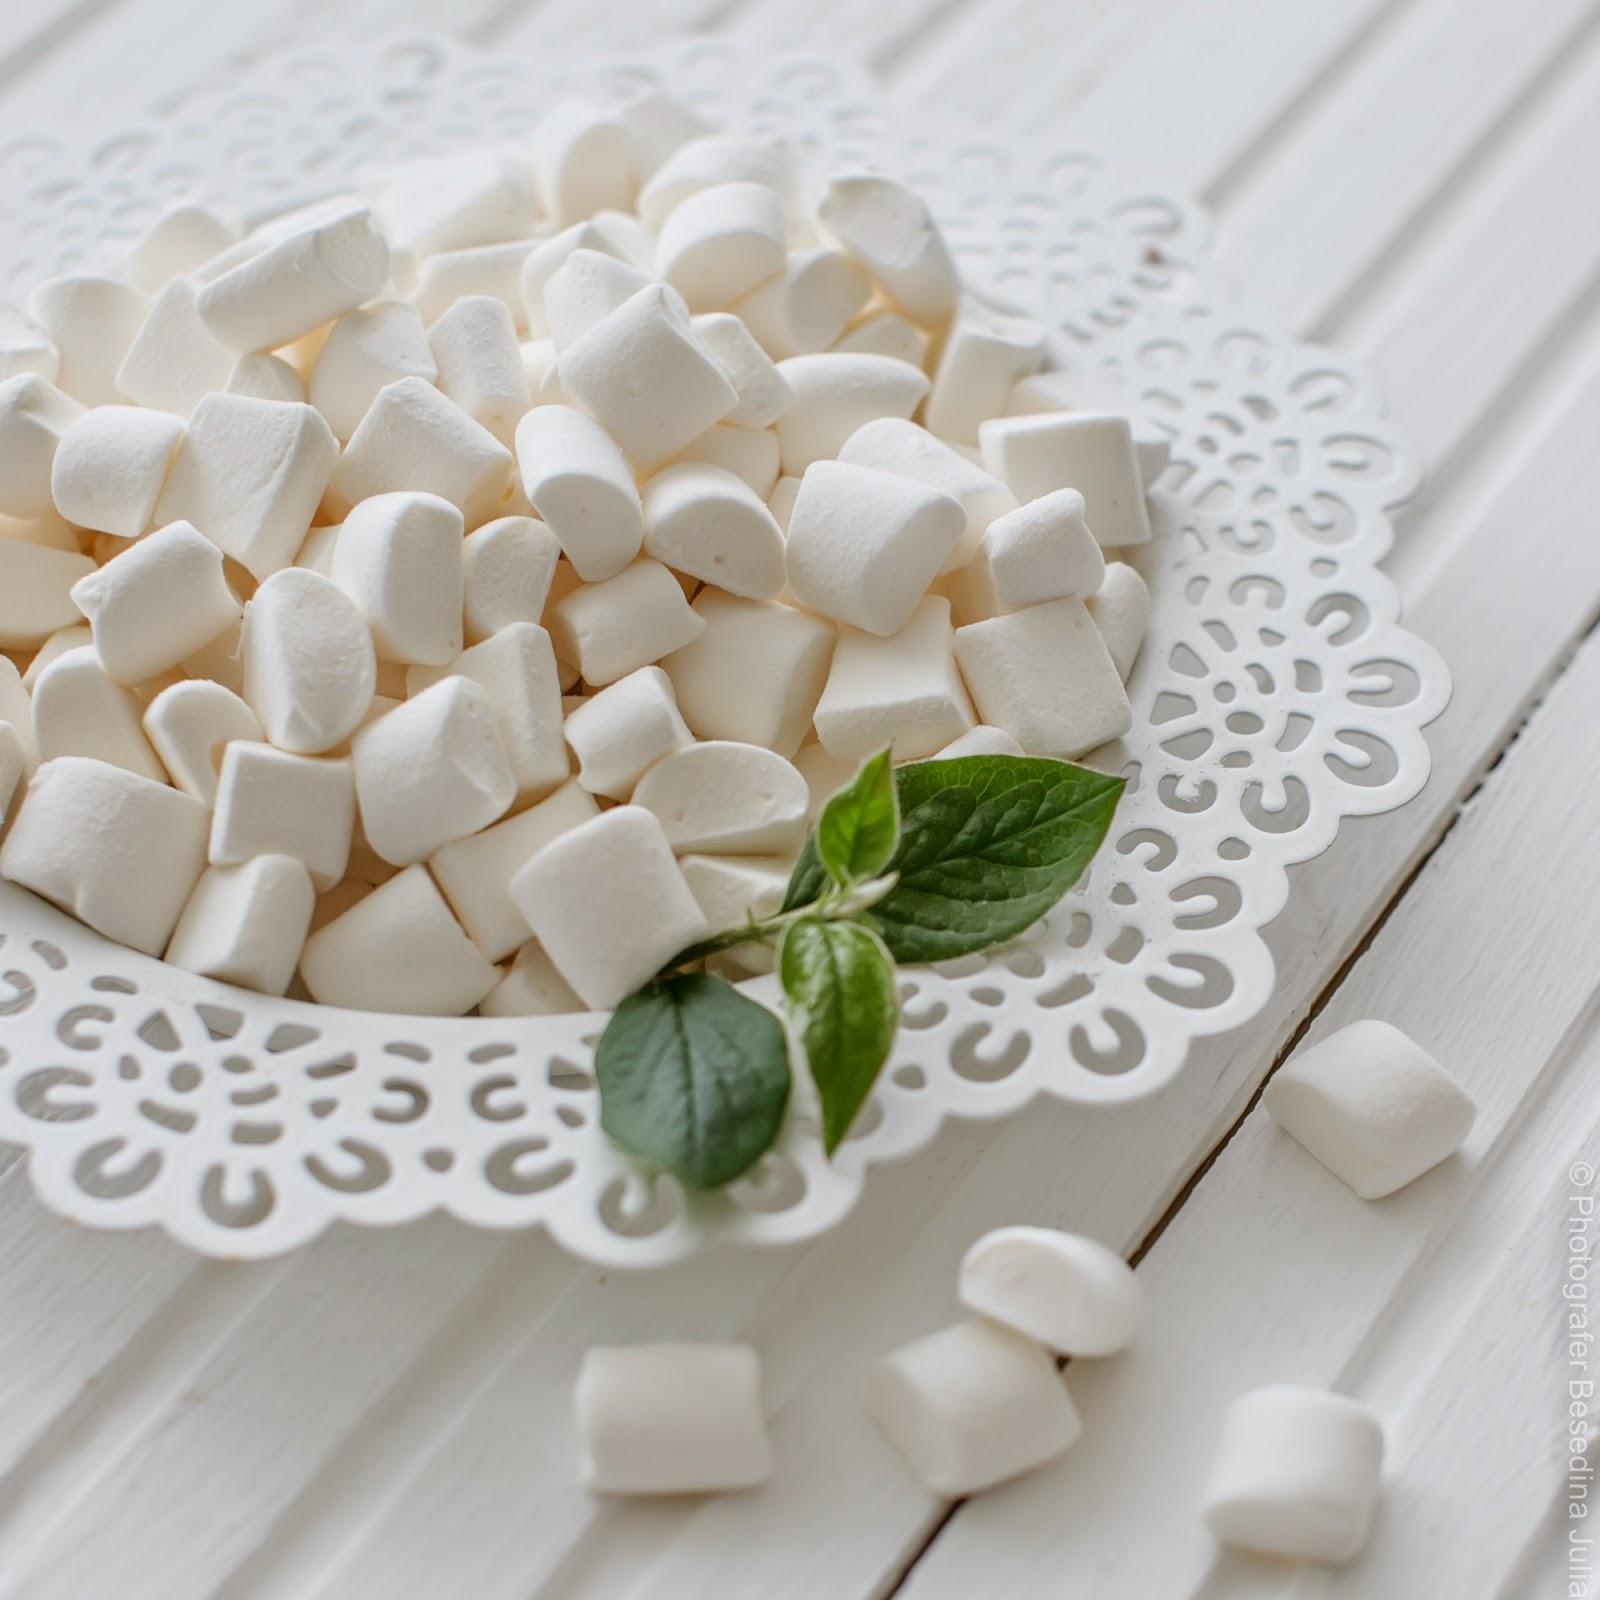 Блюда из маршмеллоу рецепт в домашних условиях